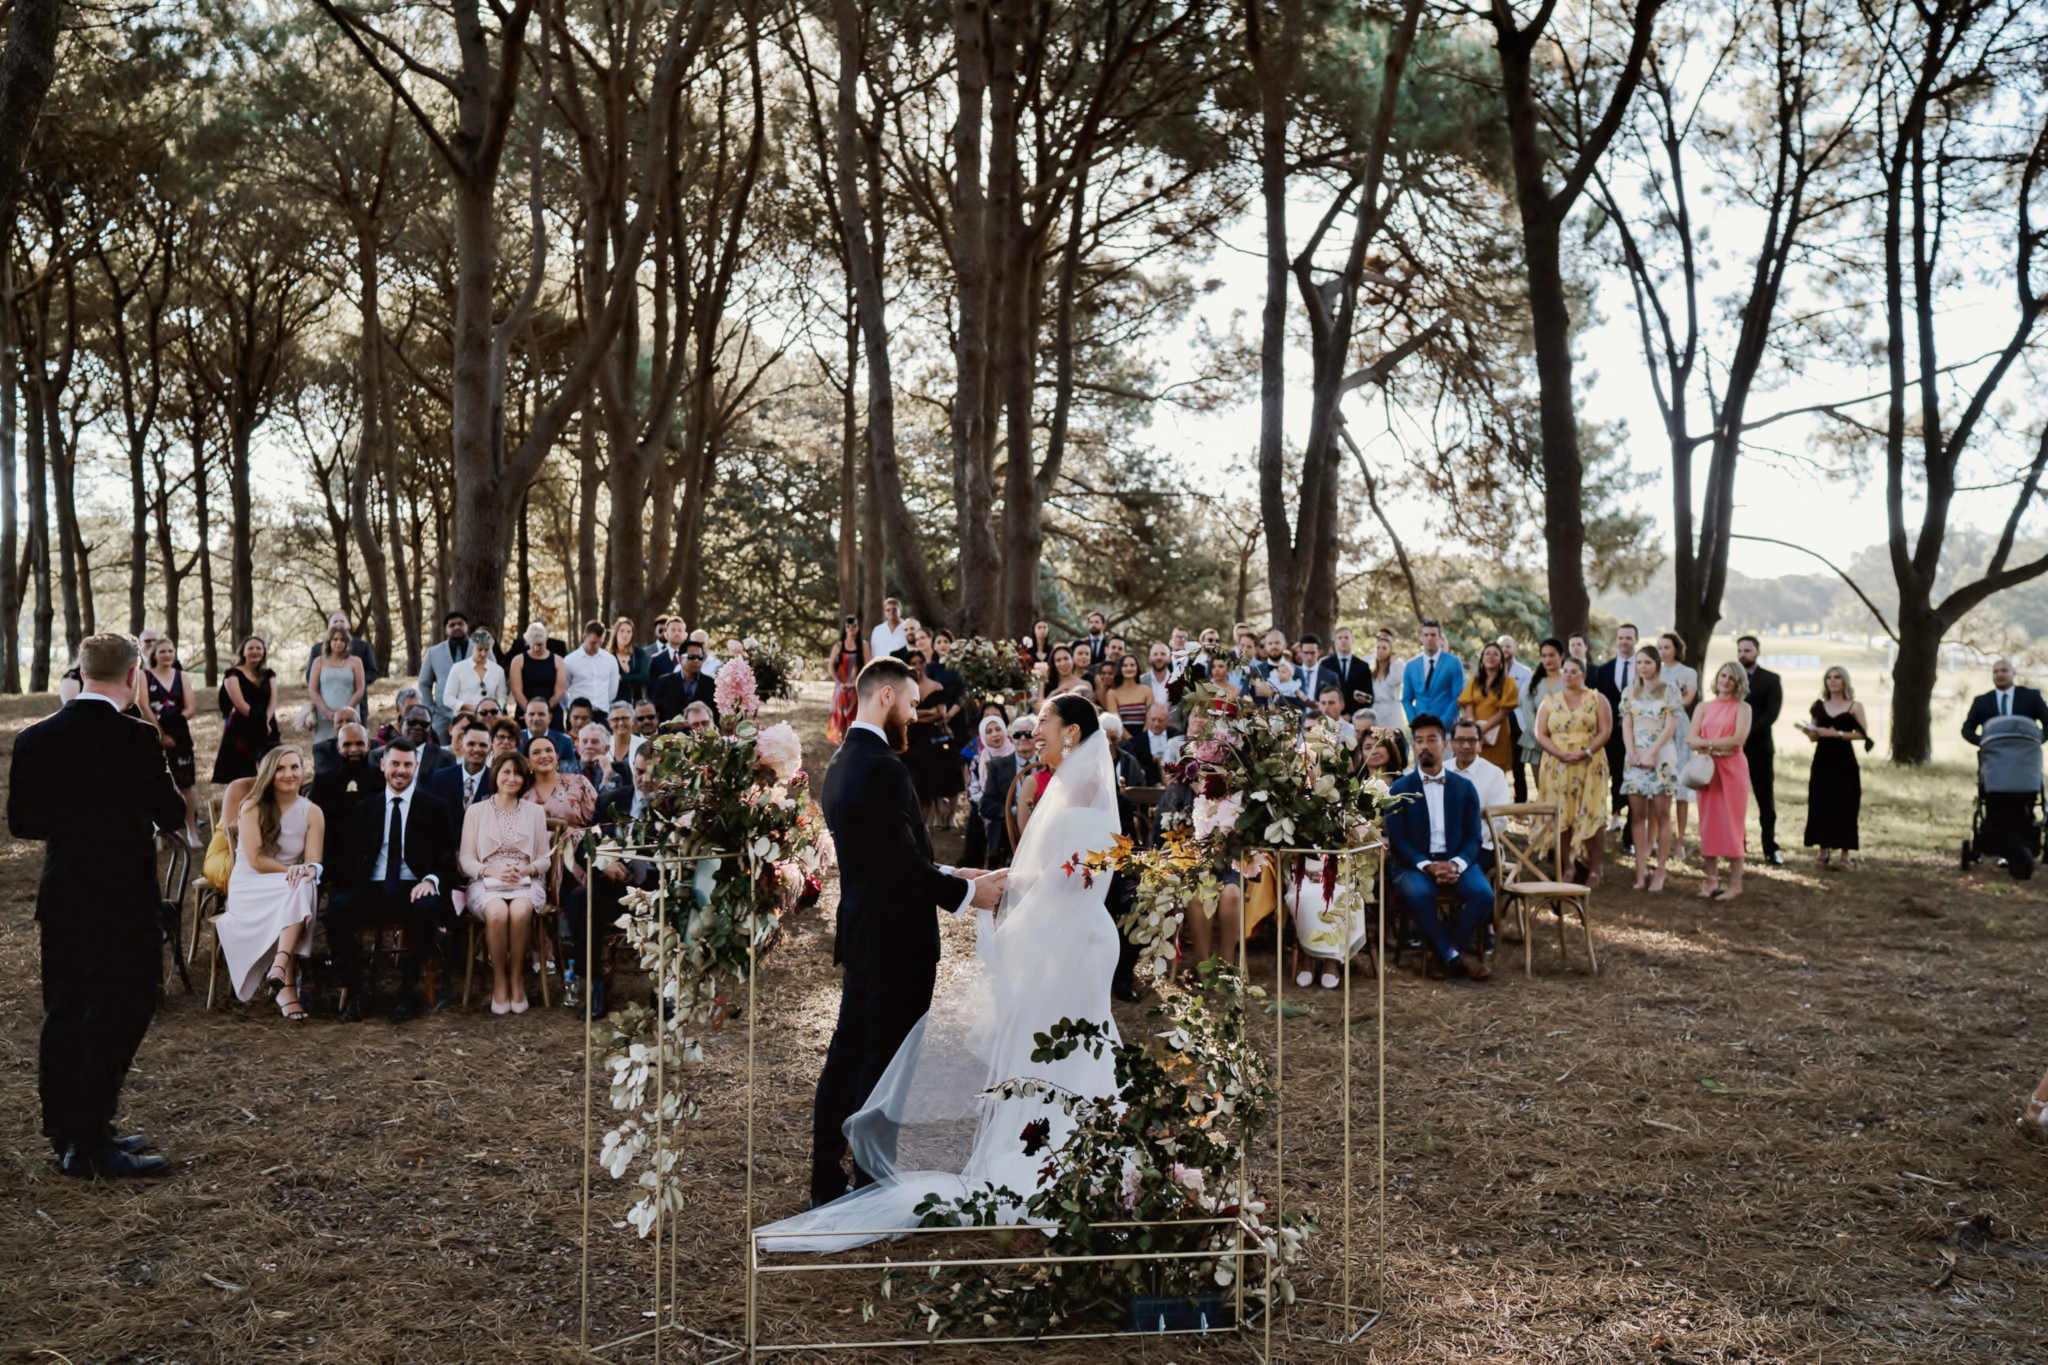 Kim and Dan Everyone - Sydney Marriage Celebrant Stephen Lee